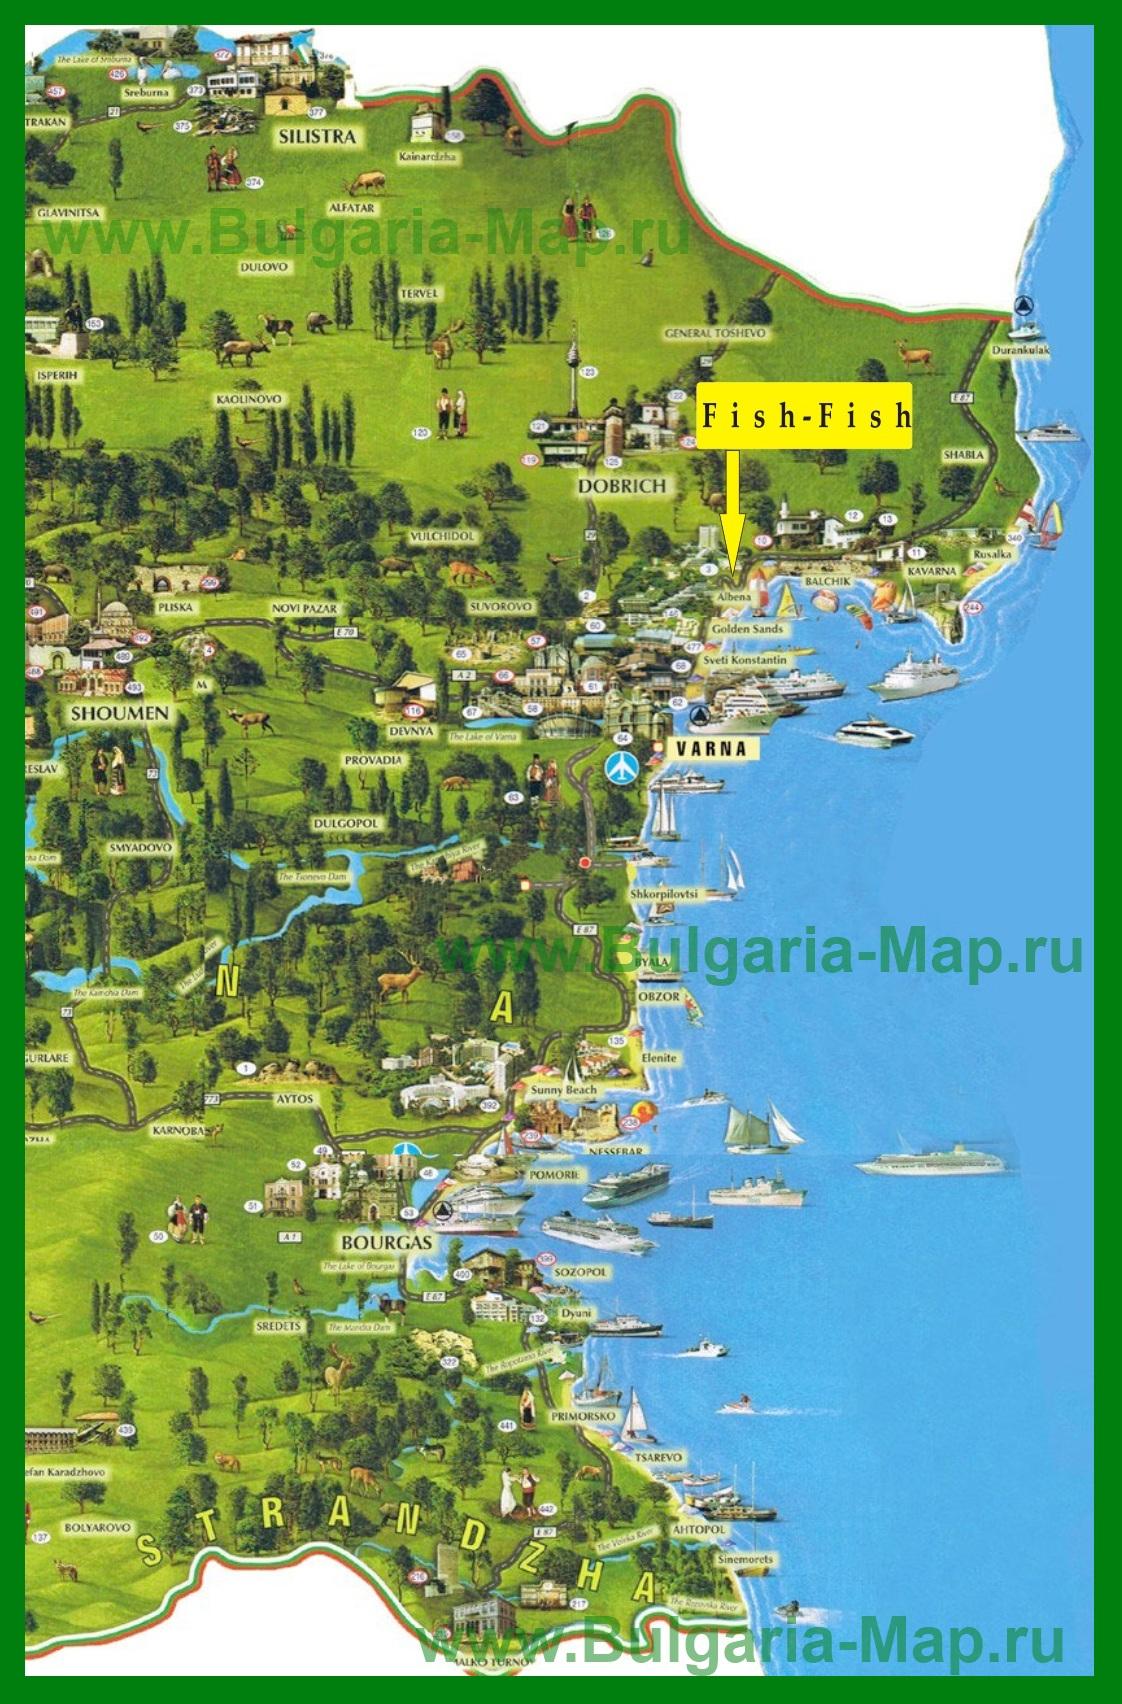 bulgaria map with Karta Poberejiya Bolgarii S Kurortami on Carte as well K 35 039 3 en moreover Bulgaria besides Index additionally KazanlakCity.